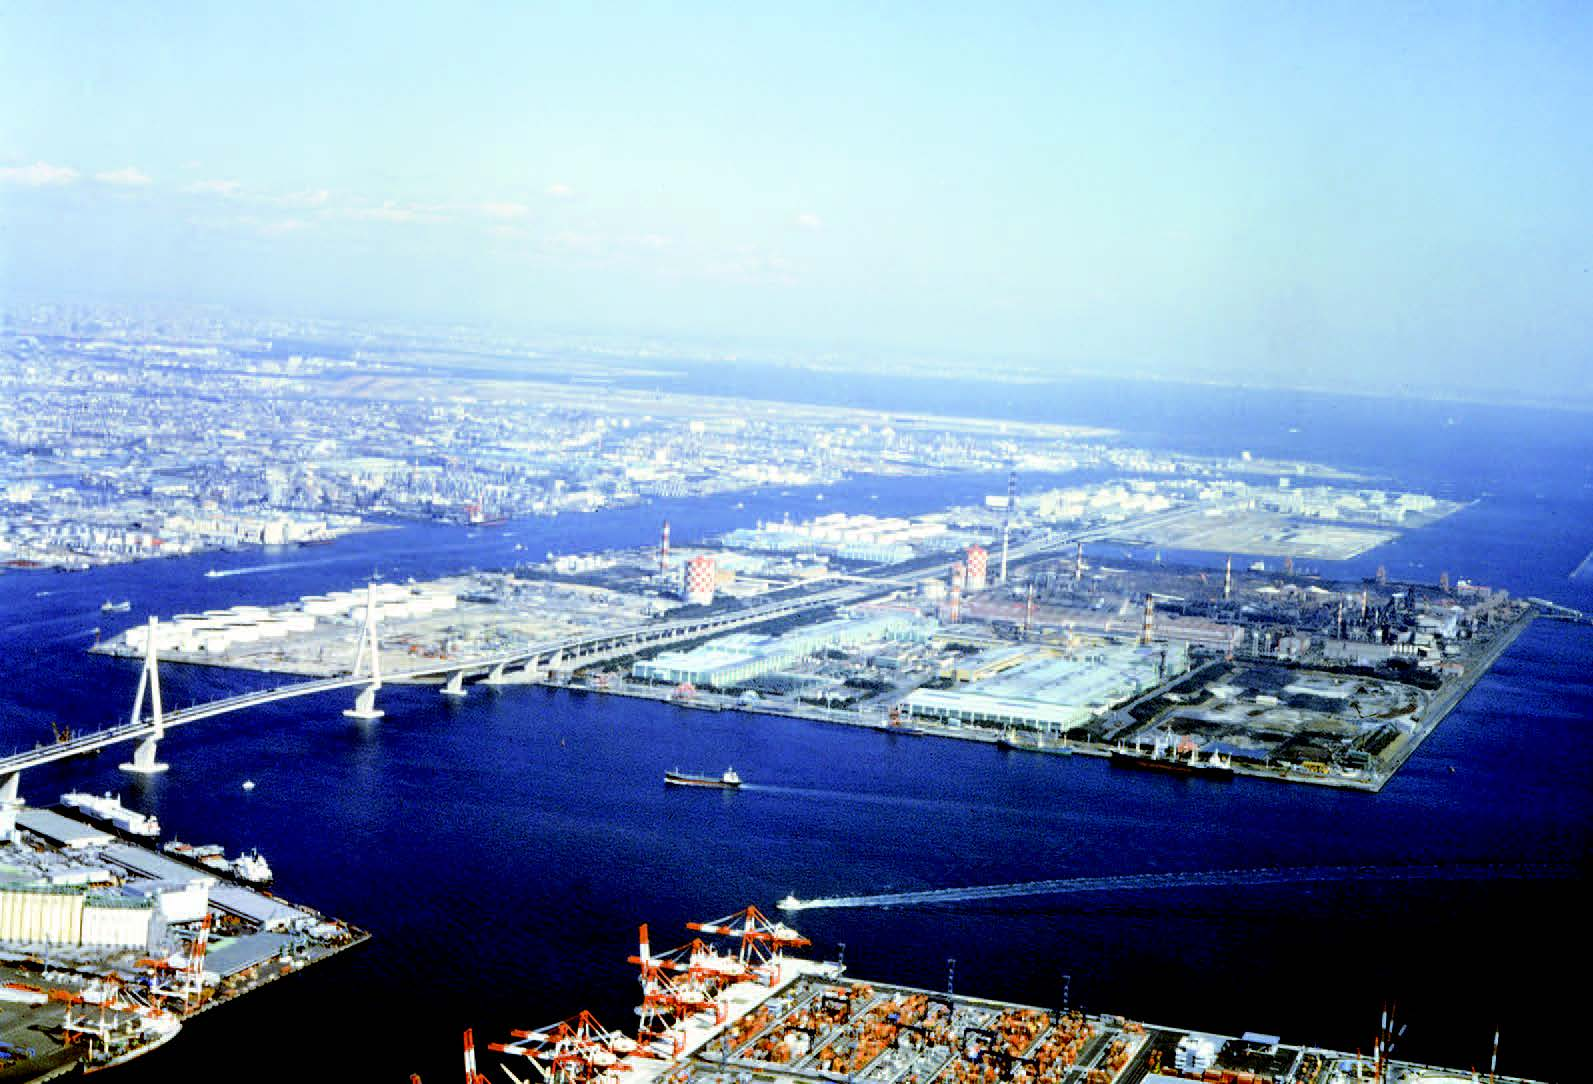 JFEスチール、粗鋼能力400万トン削減 23年度めど 京浜第2高炉休止